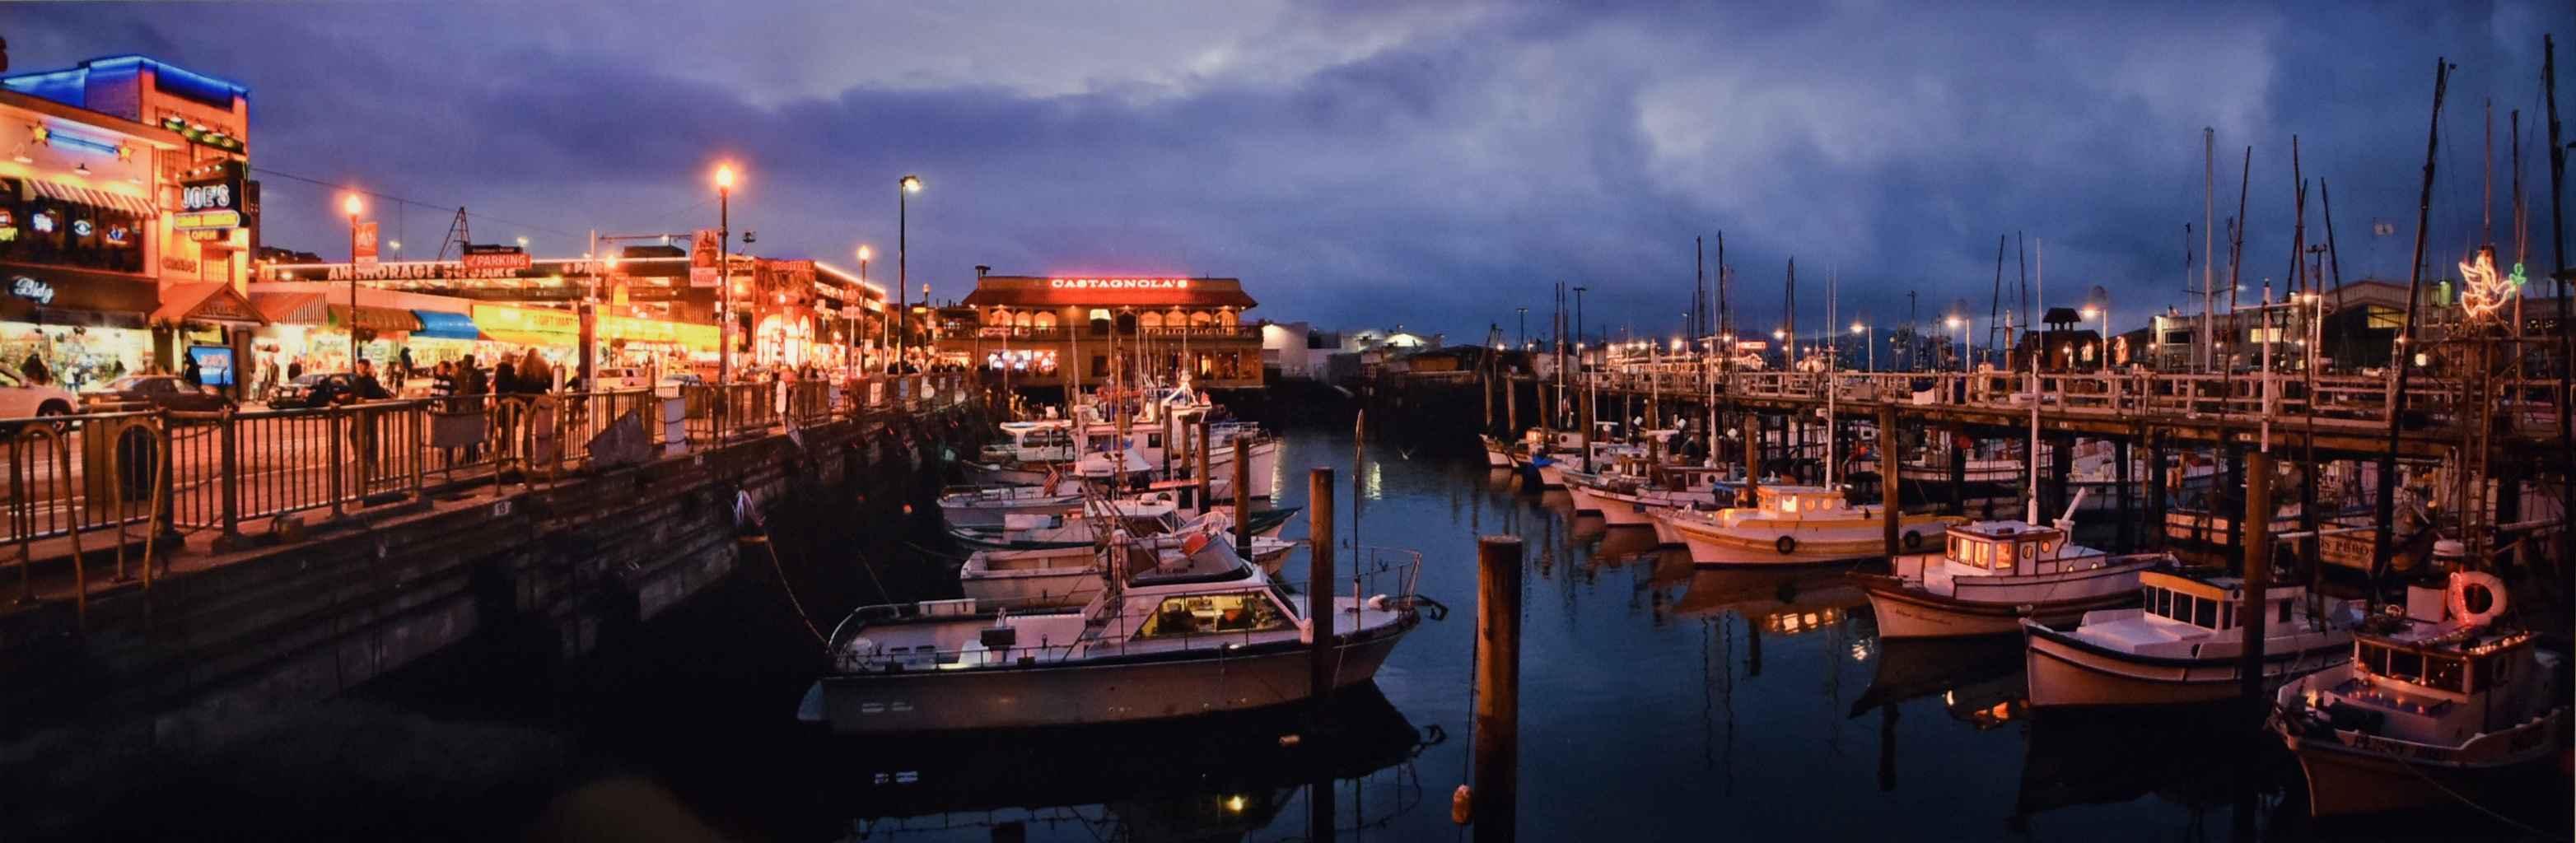 Harbor by  George Jerkovich - Masterpiece Online